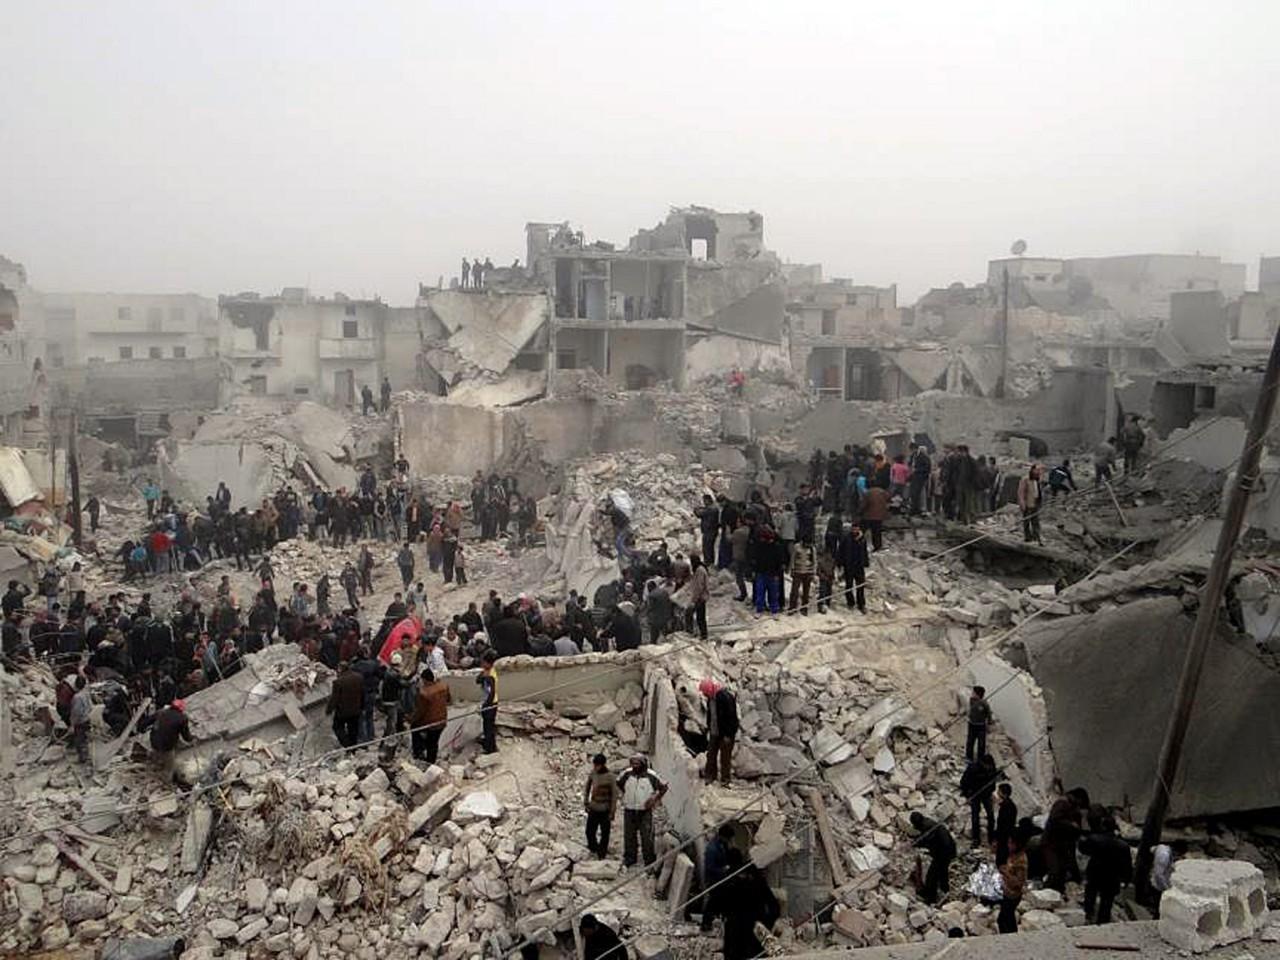 http://www.iapopsi.gr/wp-content/uploads/2016/02/syria-2.jpg